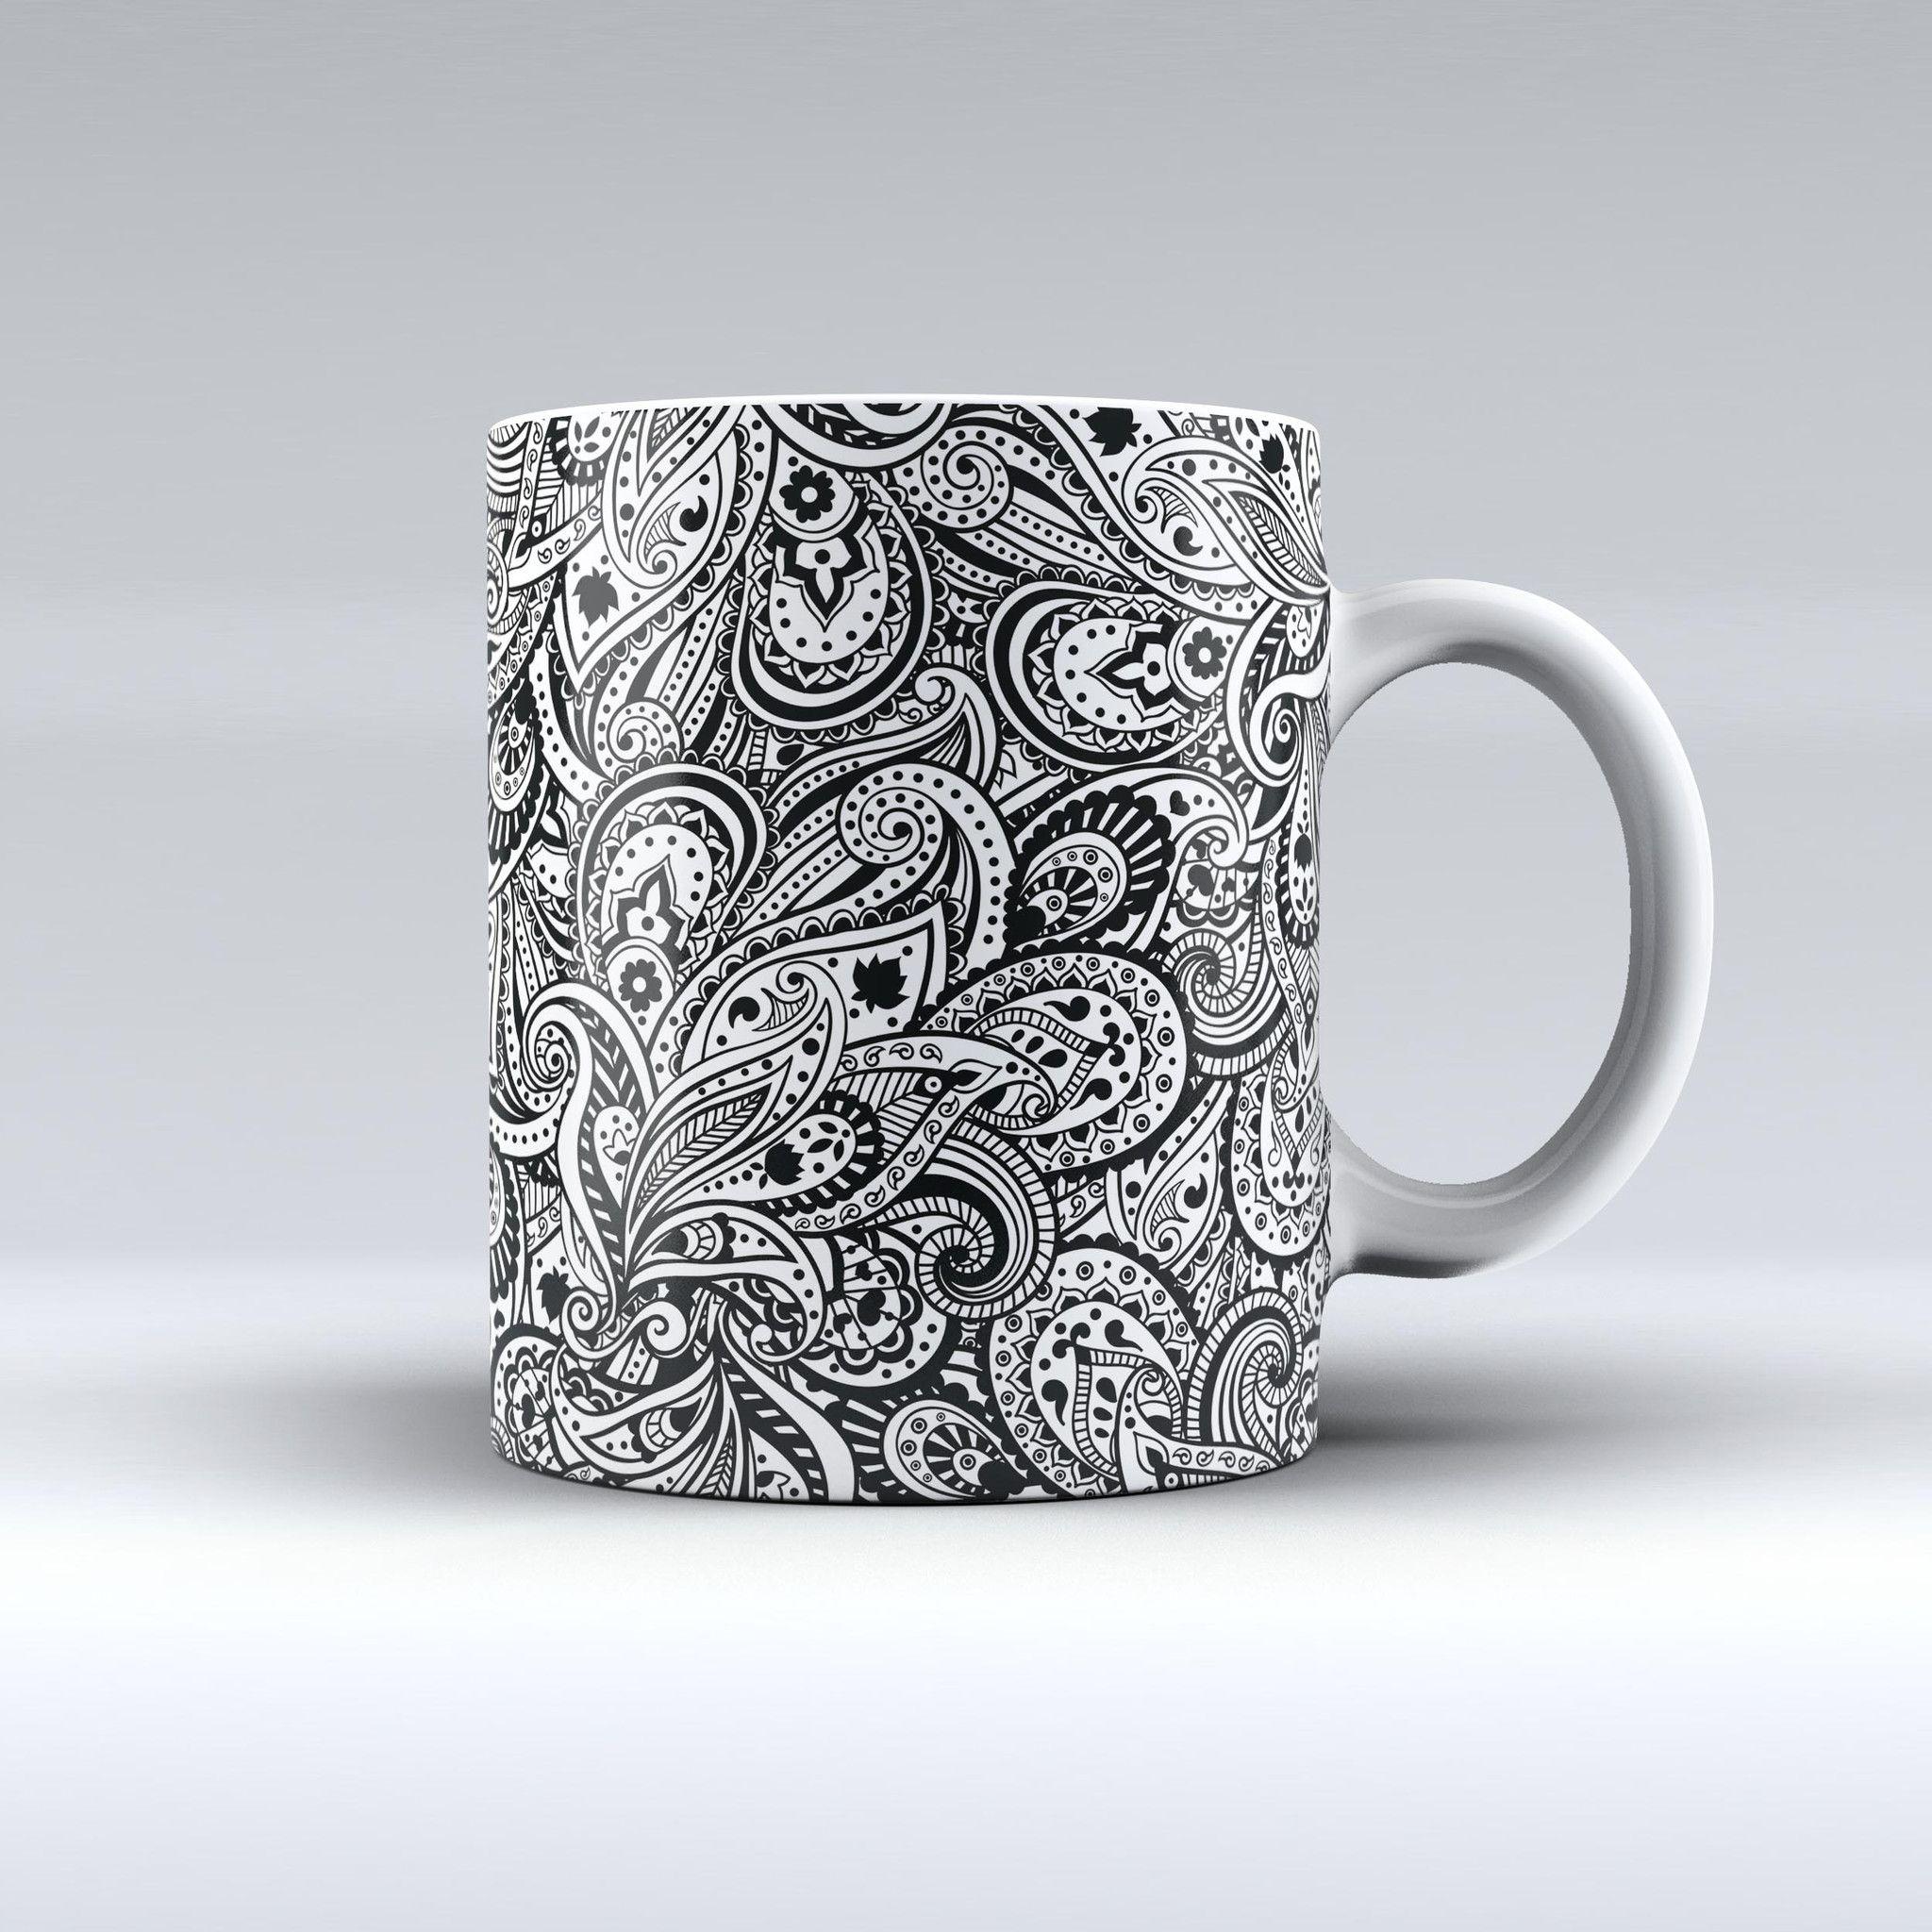 The Black and White Aztec Paisley ink-Fuzed Ceramic Coffee Mug | INK ...